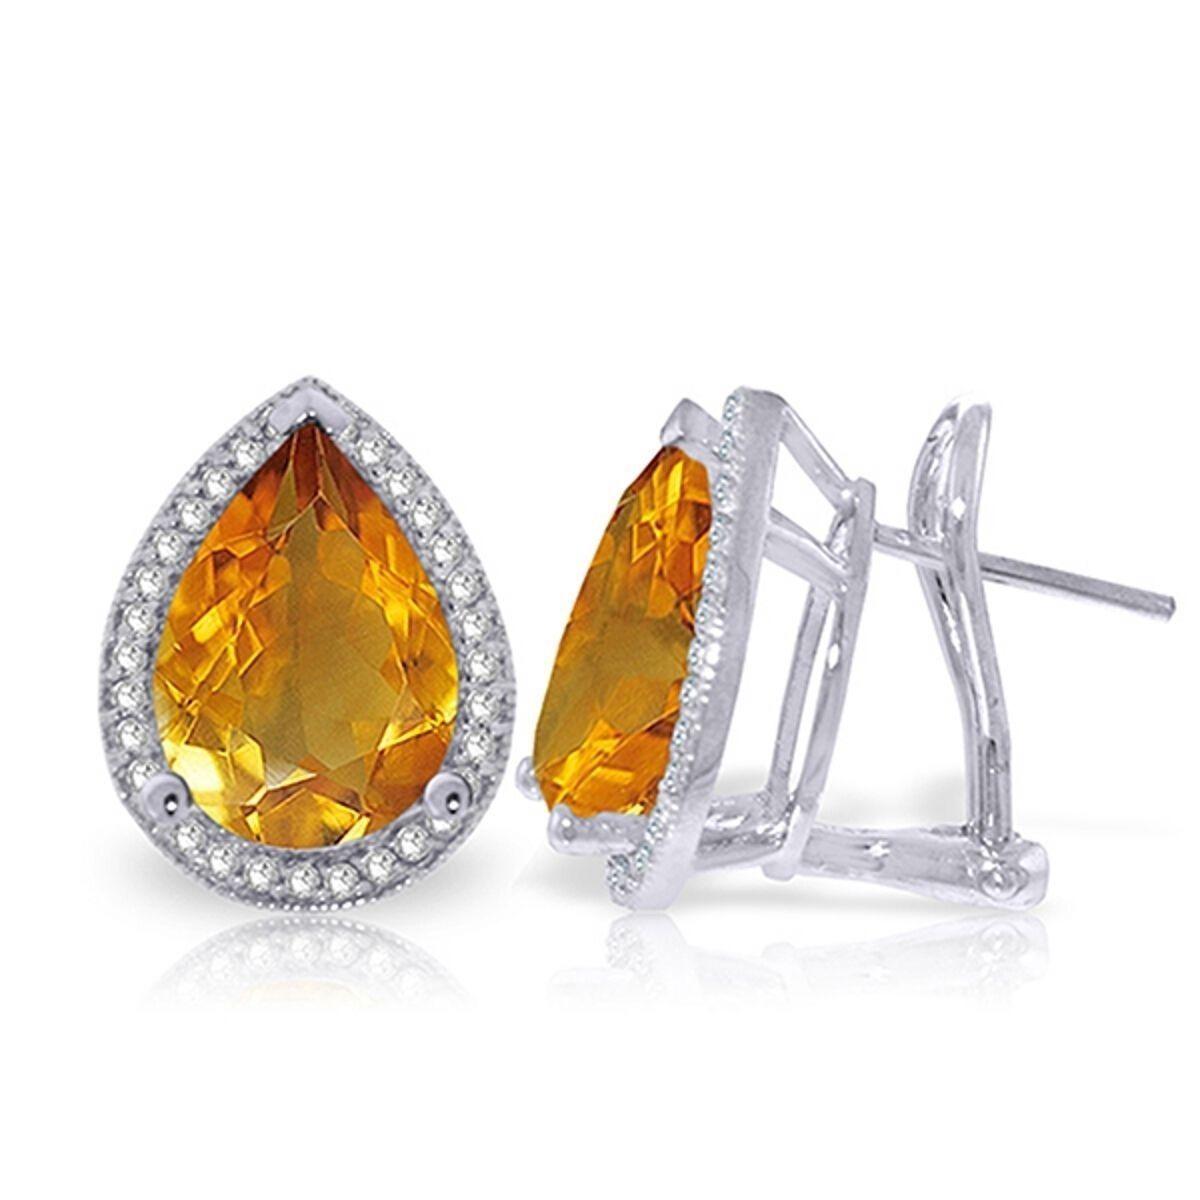 Genuine Citrine Pear Gemstones & Diamonds French Clip Halo Earrings In 14K gold